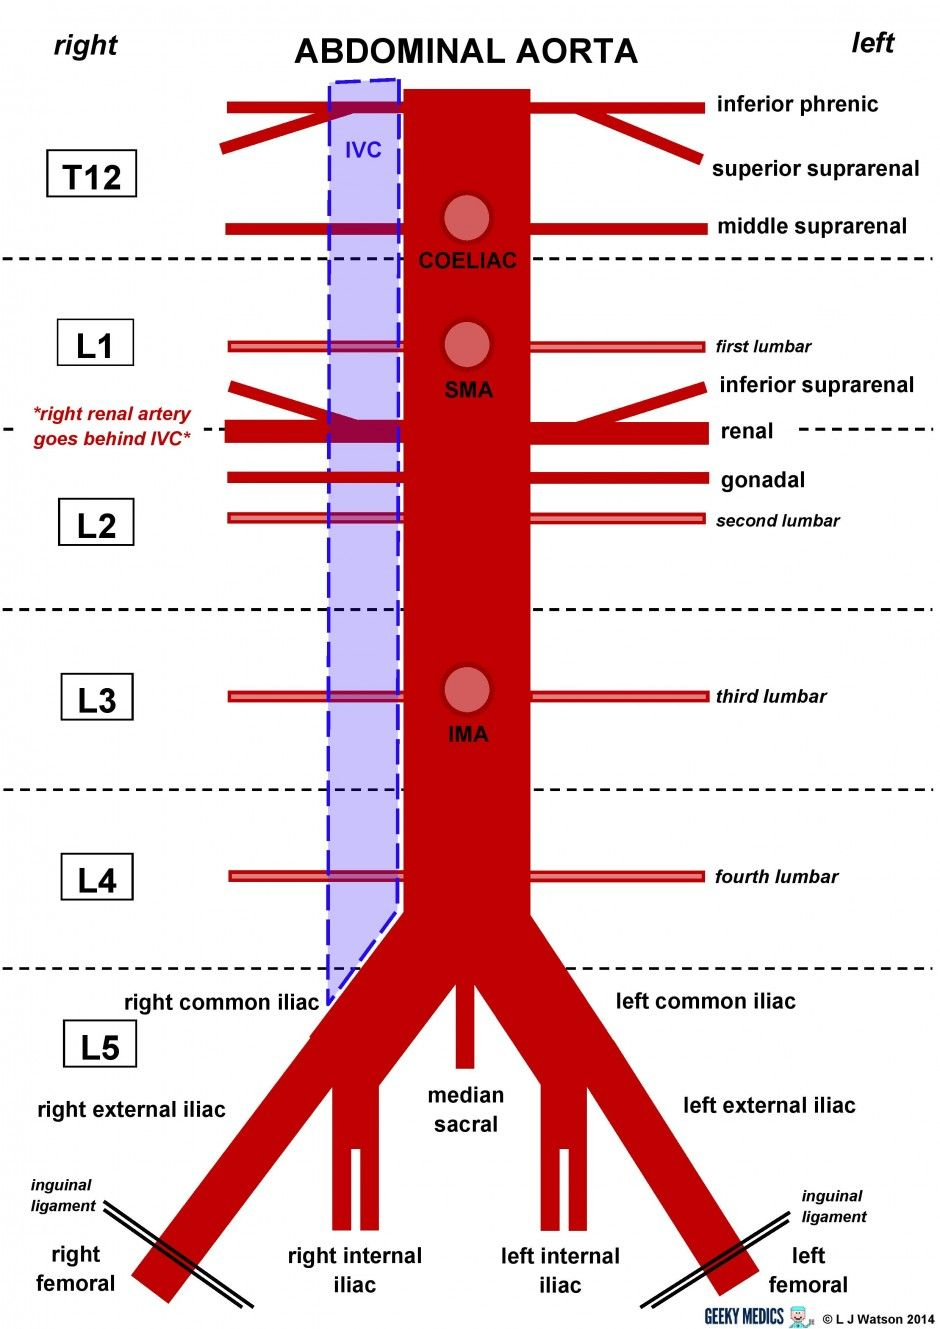 aorta geeky medics | Nursing stuff | Pinterest | Medicina